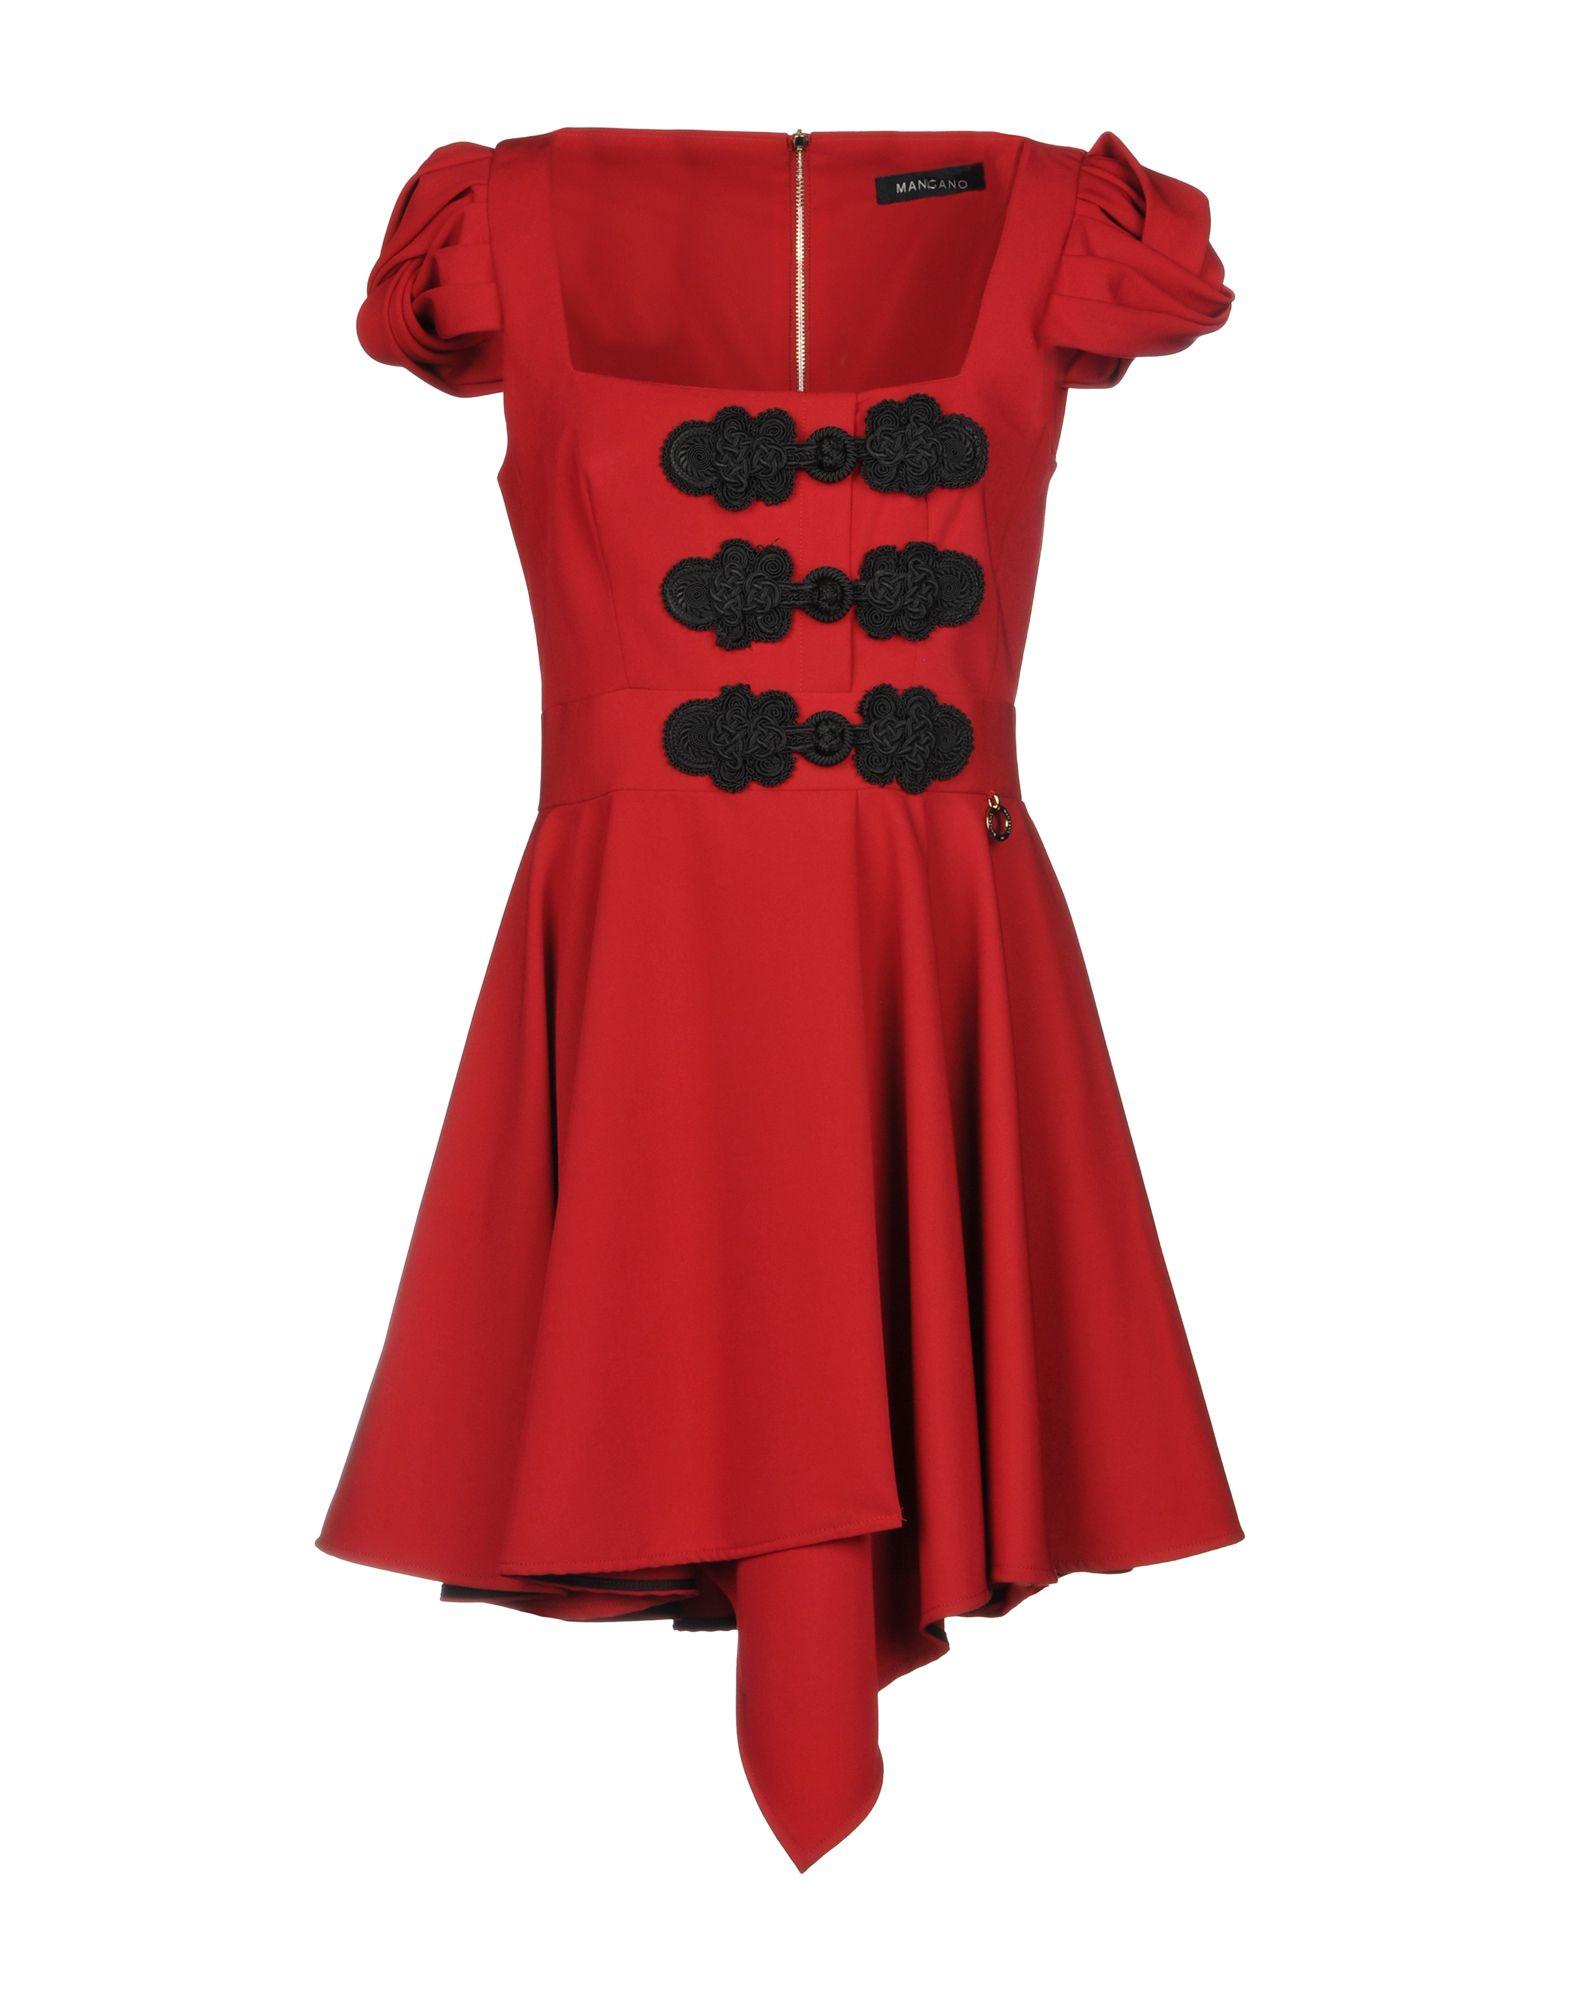 MANGANO Short Dress in Red